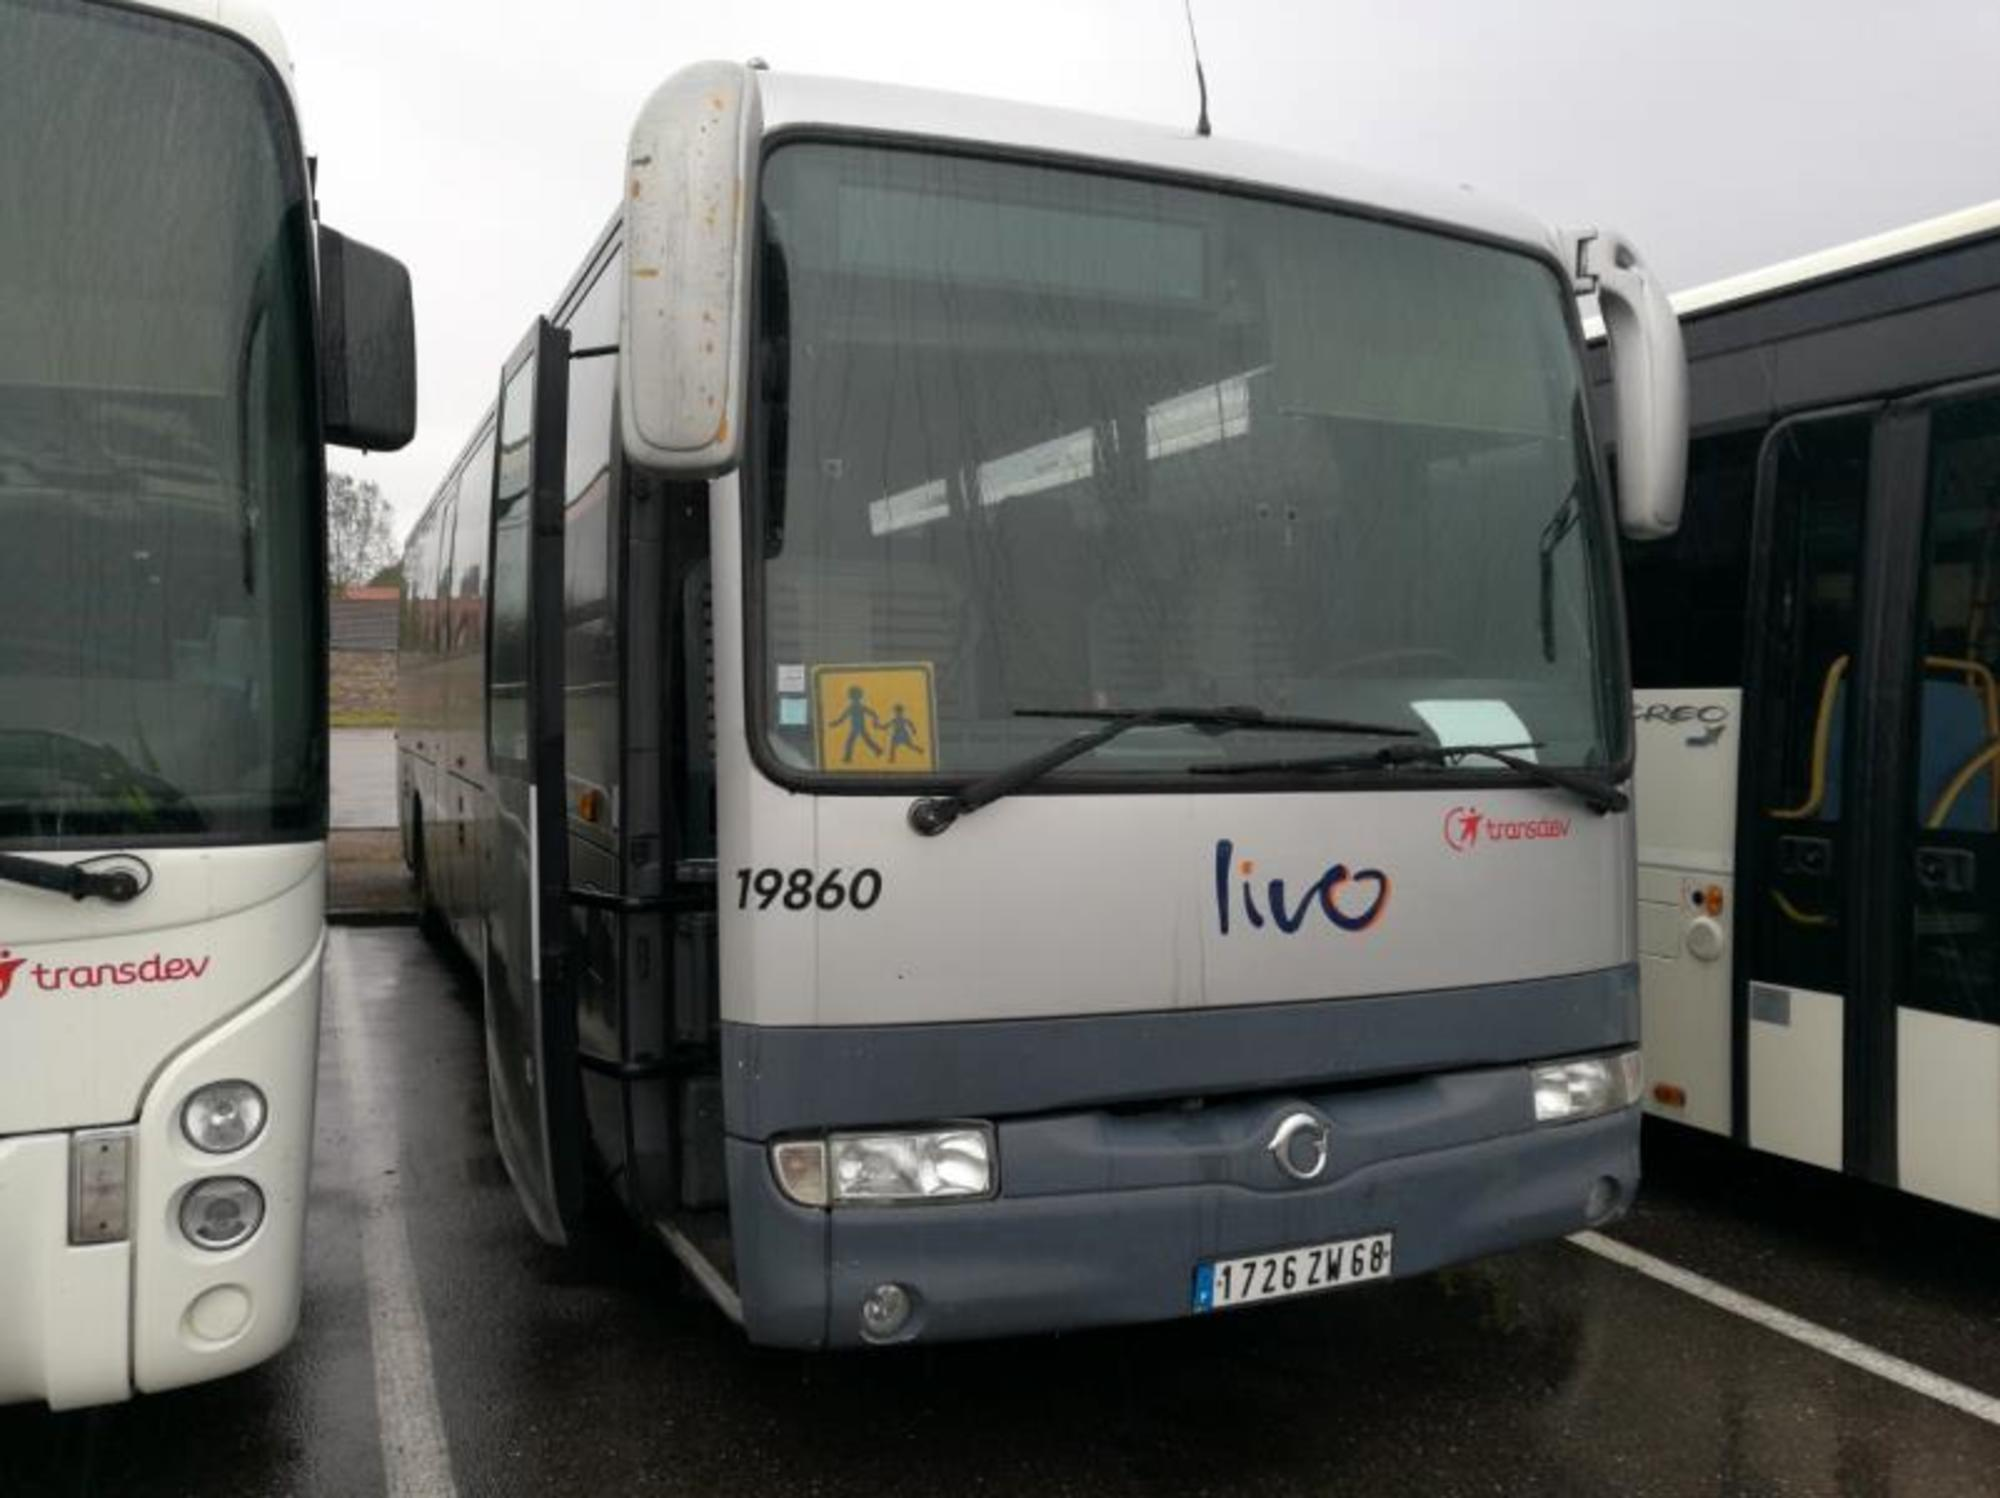 irisbus iliade 19860 car bus d 39 occasion aux ench res agorastore. Black Bedroom Furniture Sets. Home Design Ideas